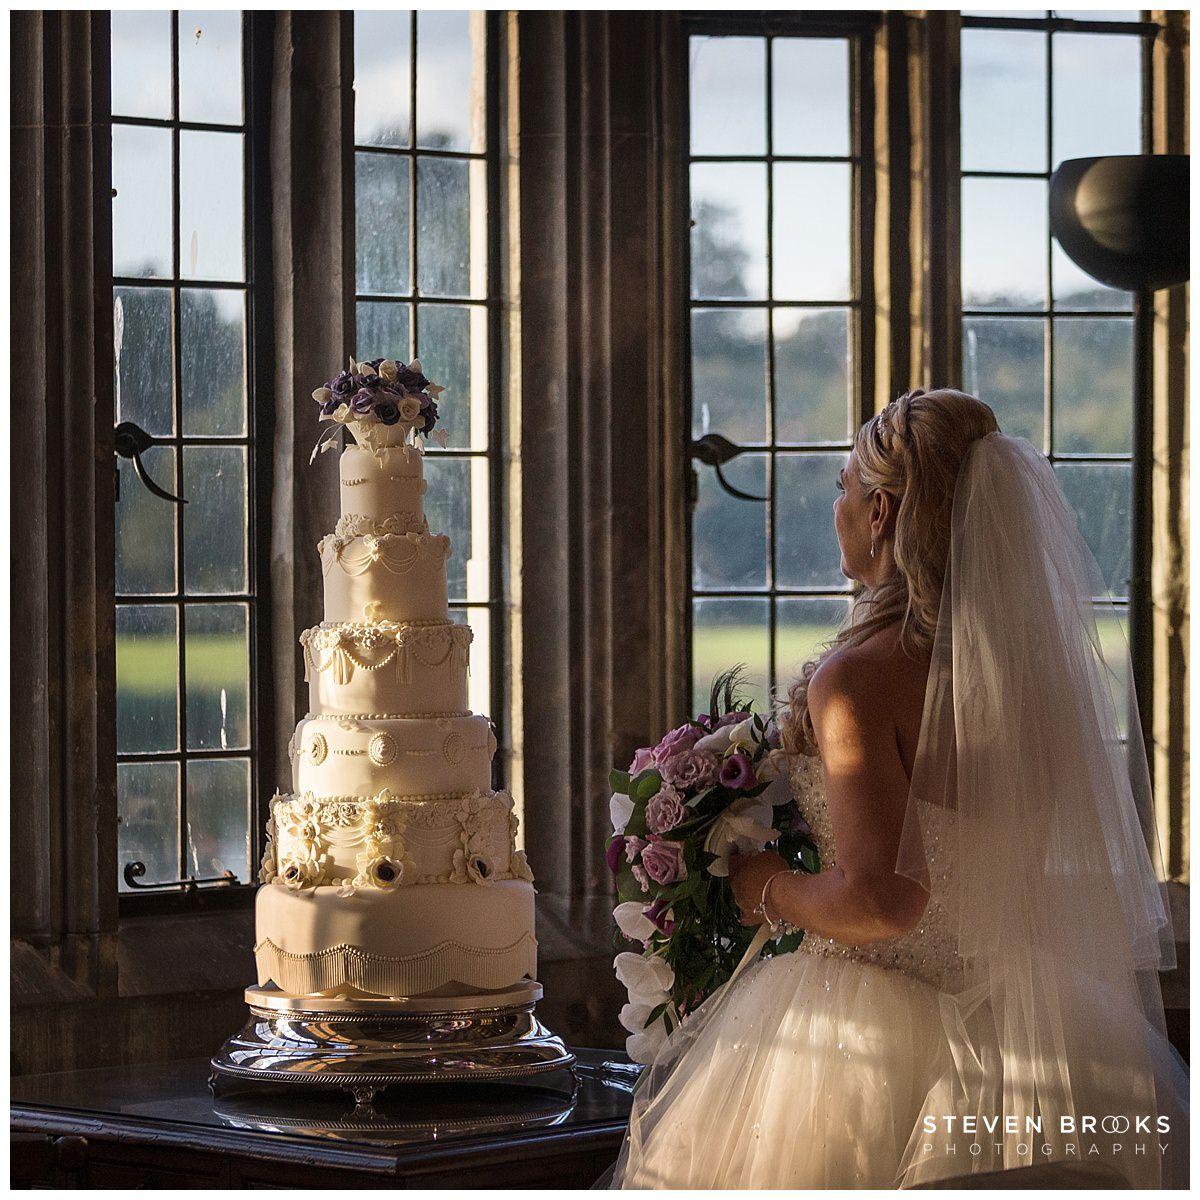 Leeds Castle wedding photographer steven brooks photographs the bride admiring the wedding cake at Leeds Castle